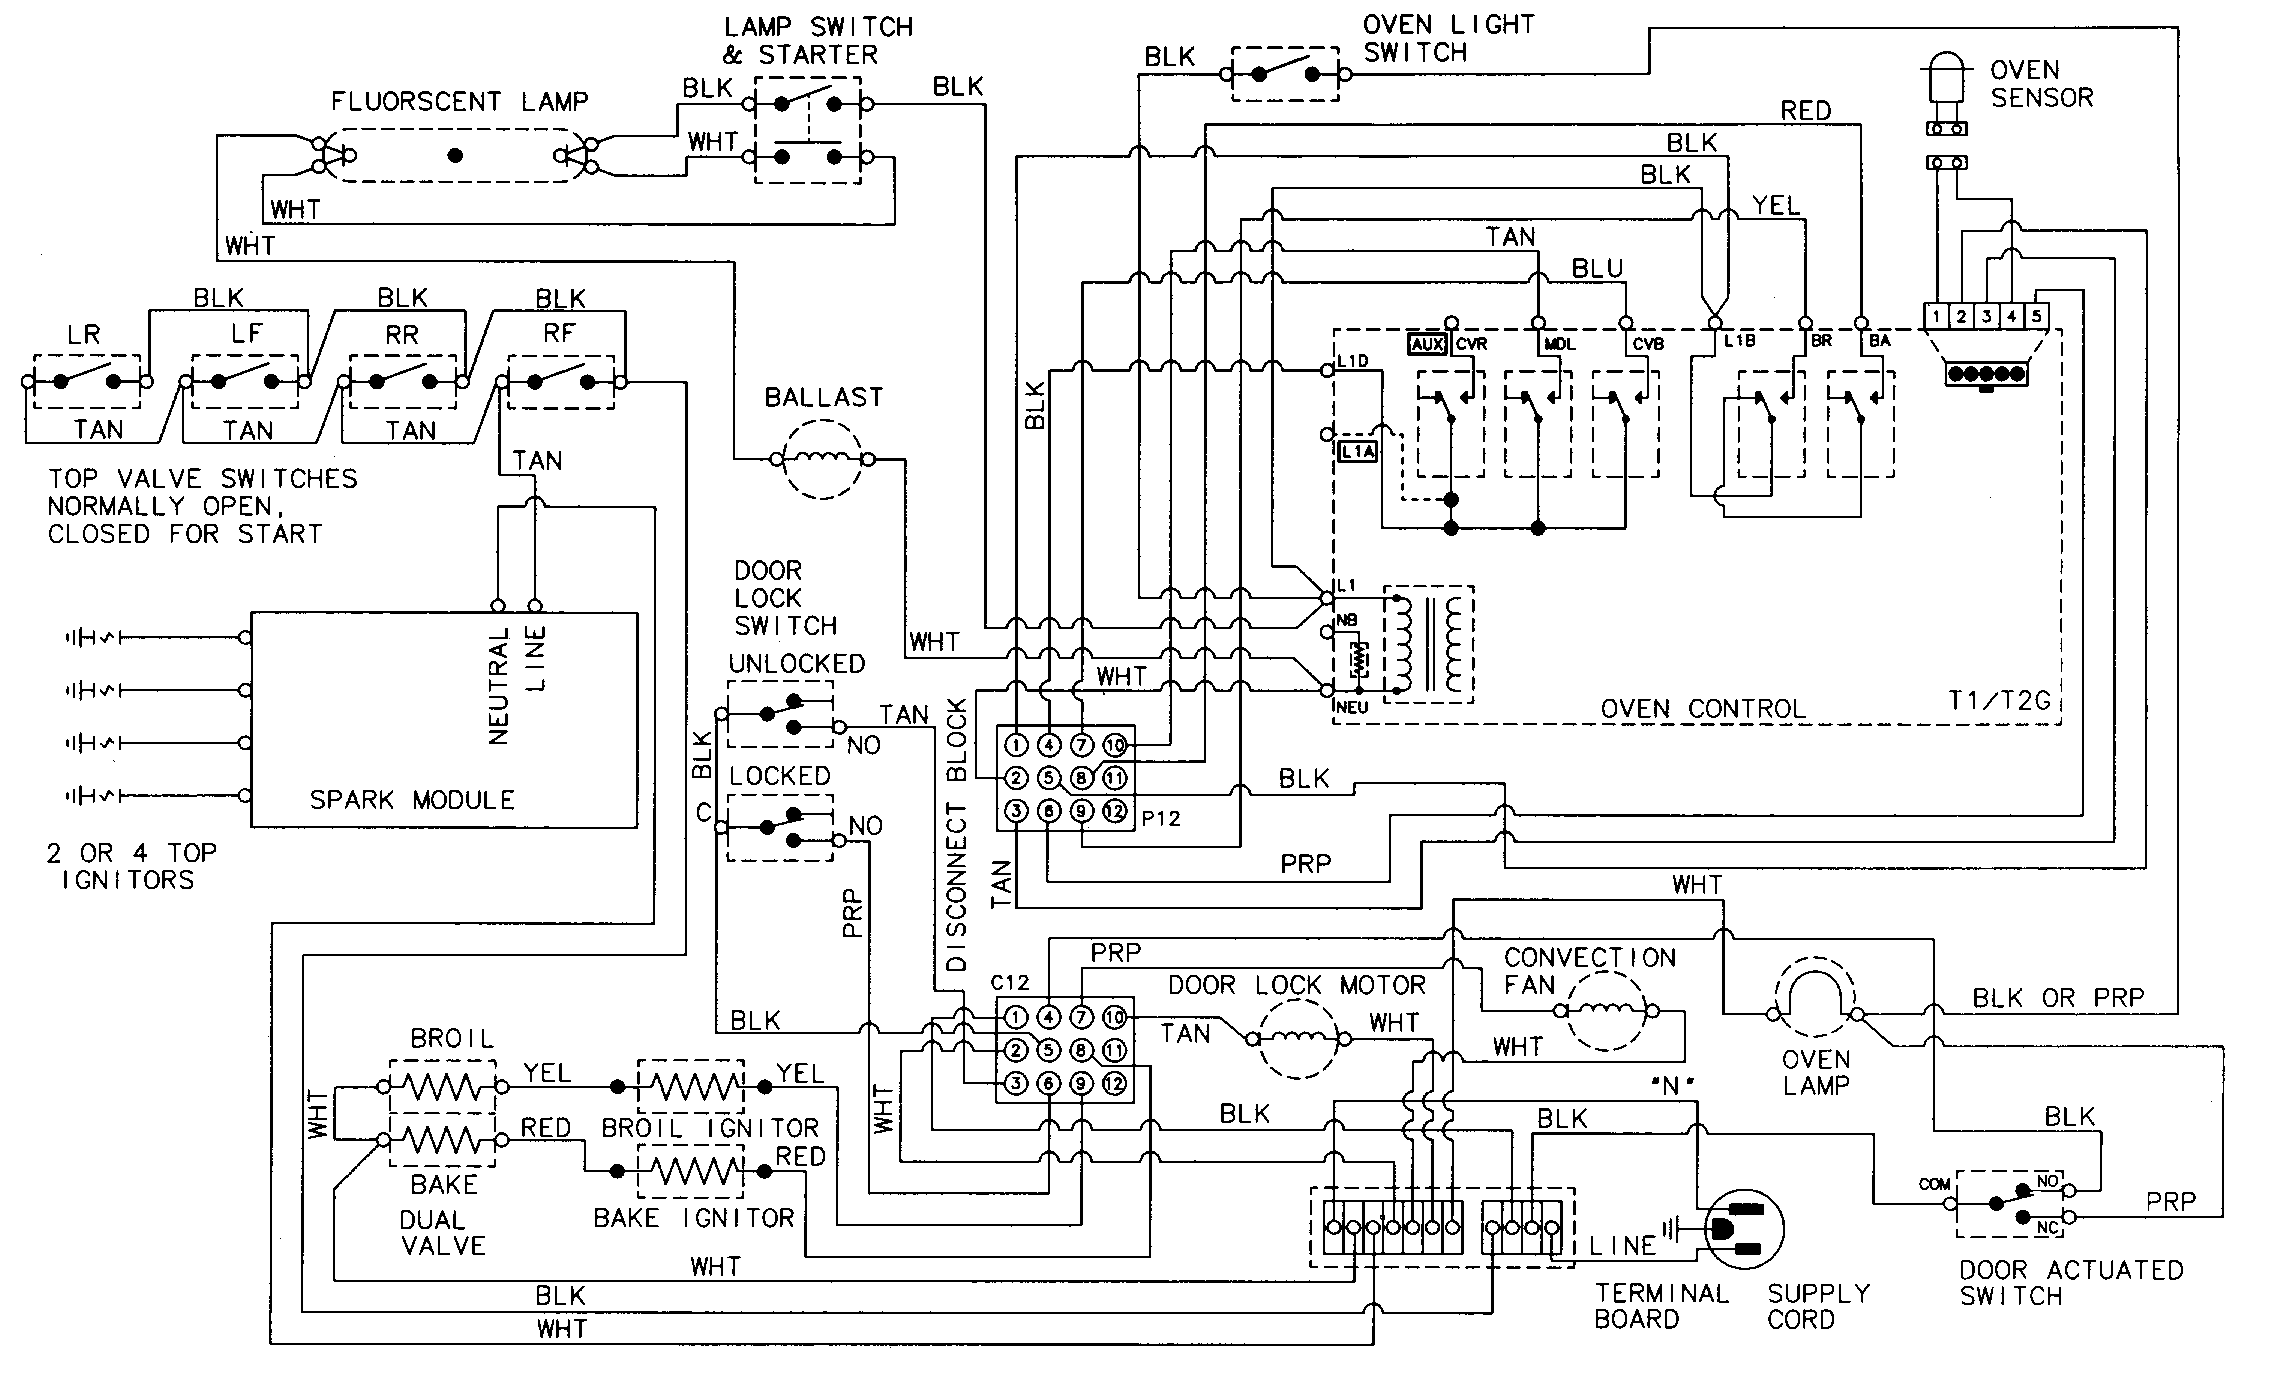 M0204067 00007?resize\=840%2C508 dod wiring diagram standard gandul 45 77 79 119 solic 200 wiring diagram at gsmx.co